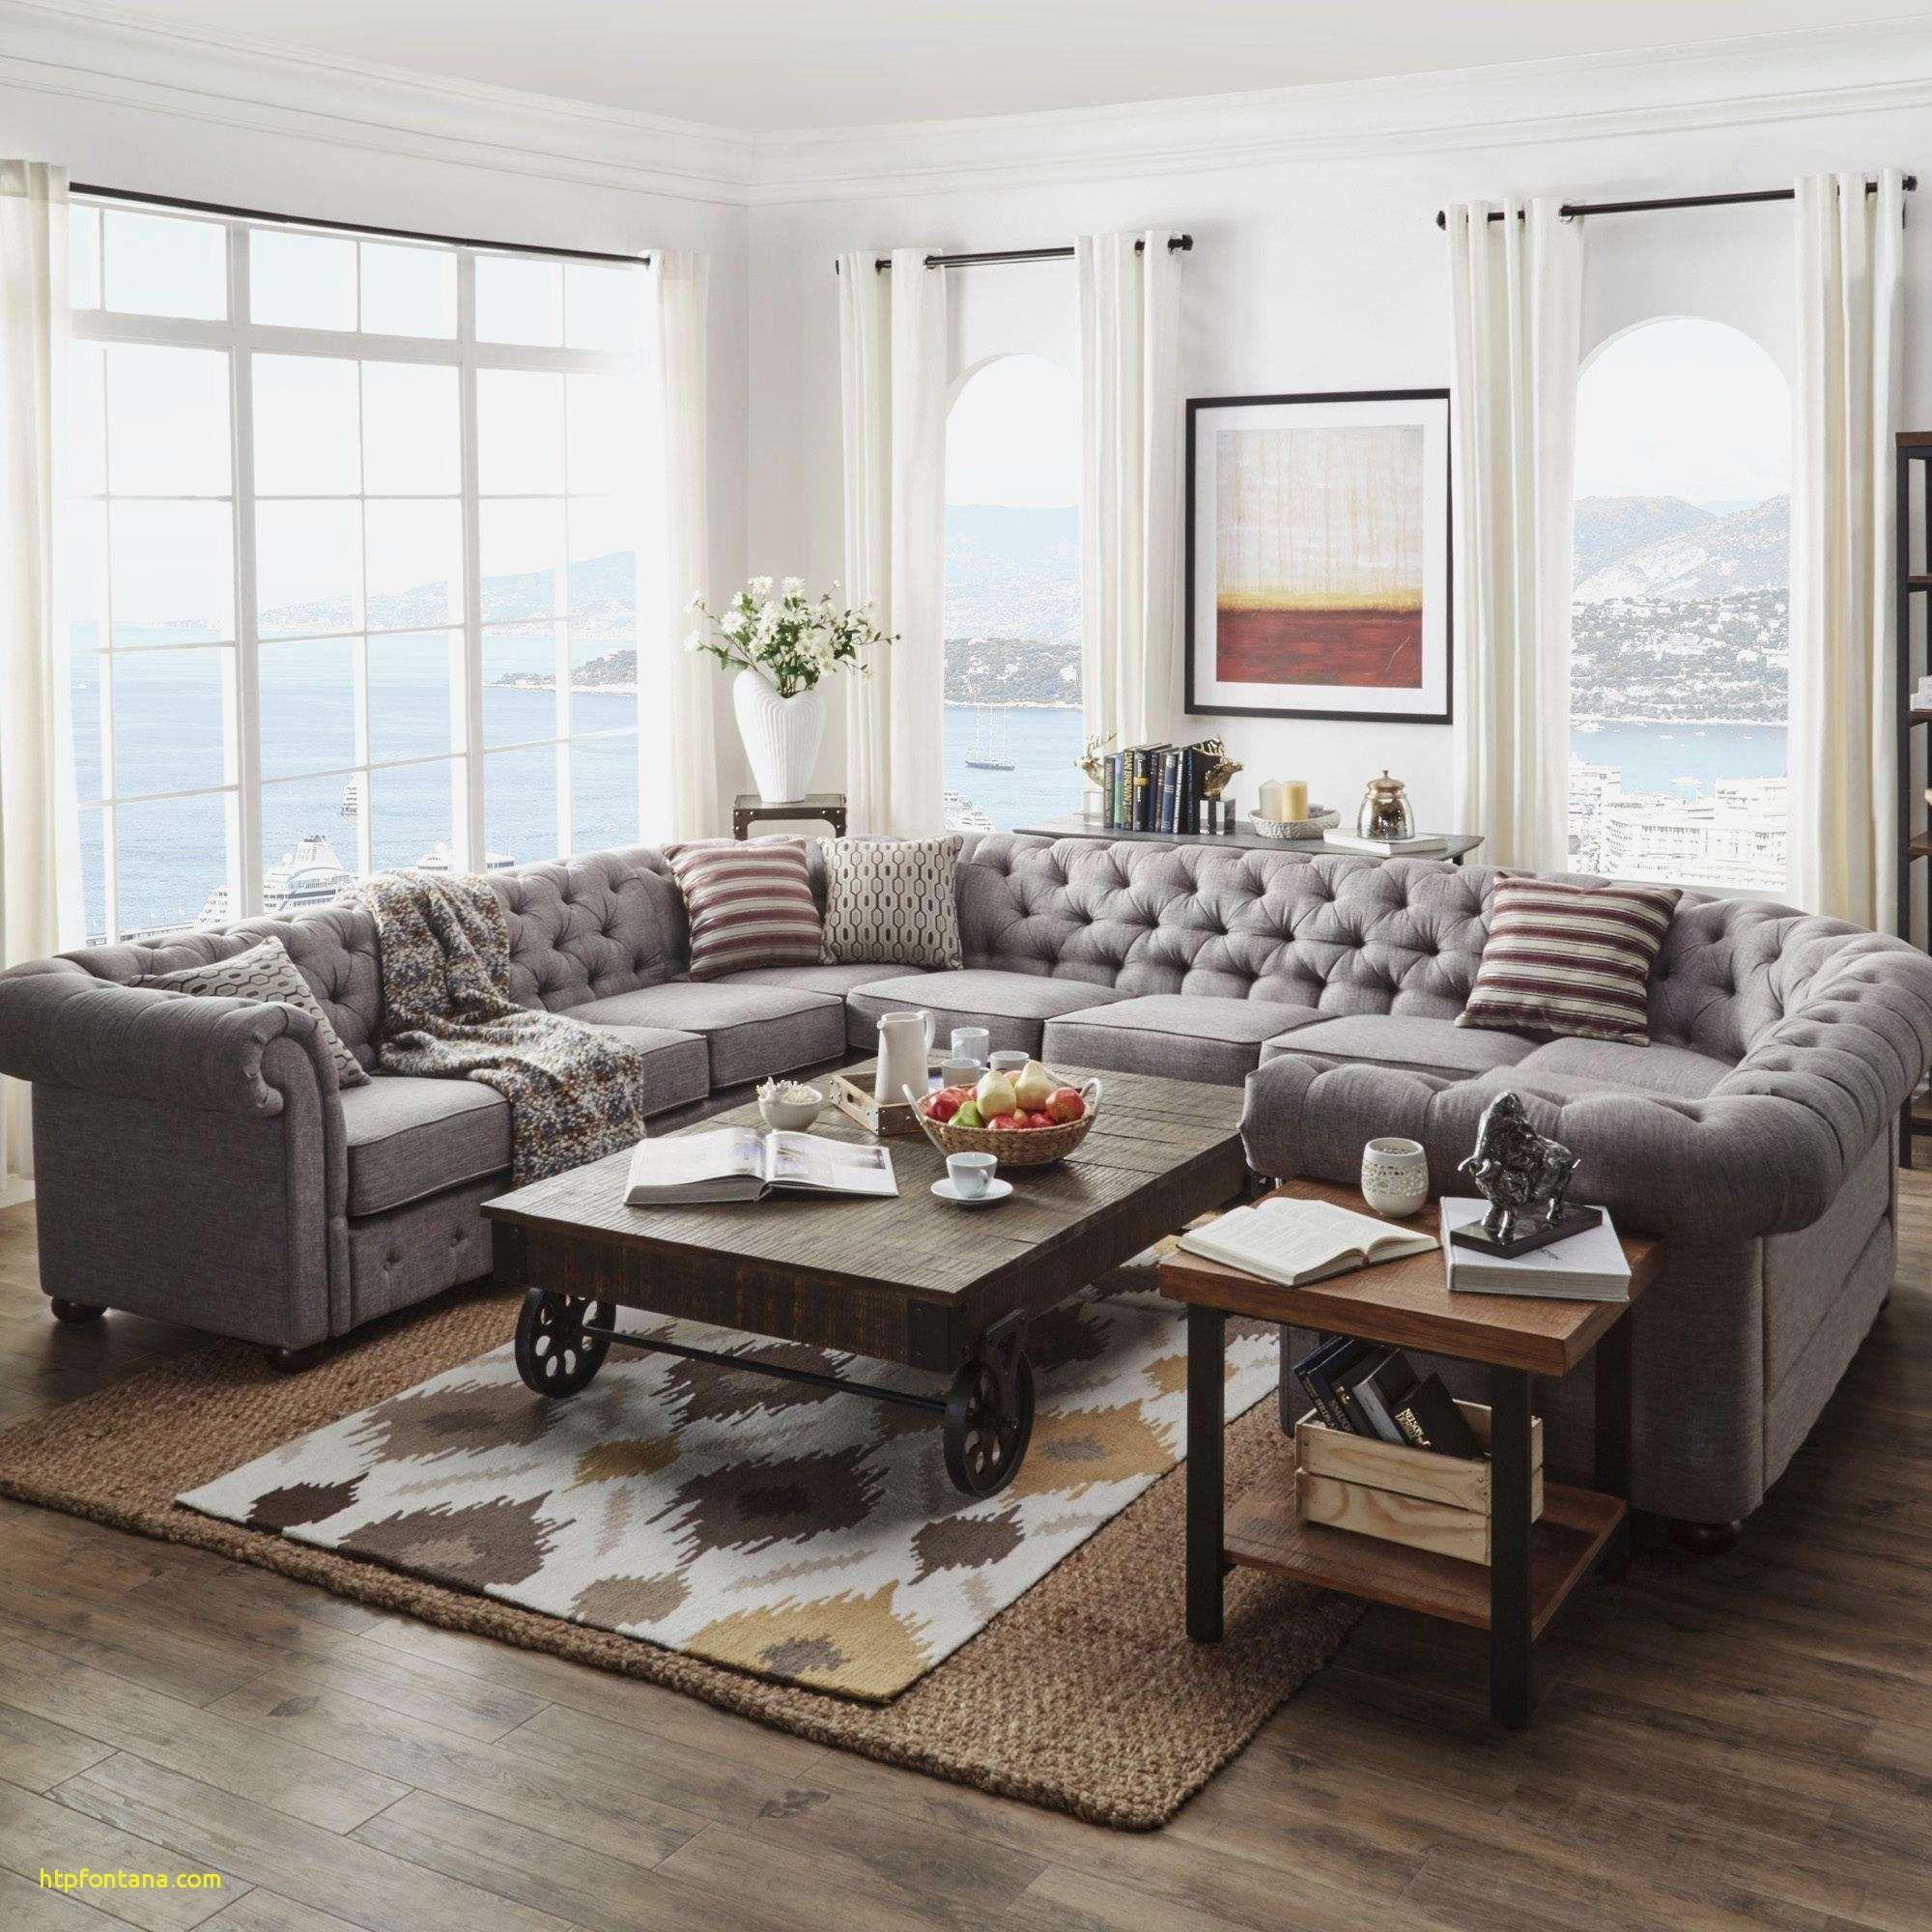 Living Room Ideas Cheap Beautiful 15 Cheap Living Room Coffee Tables Gallery Set Ruang Keluarga Gaya Ruang Tamu Dekorasi Ruang Keluarga #unique #living #room #tables